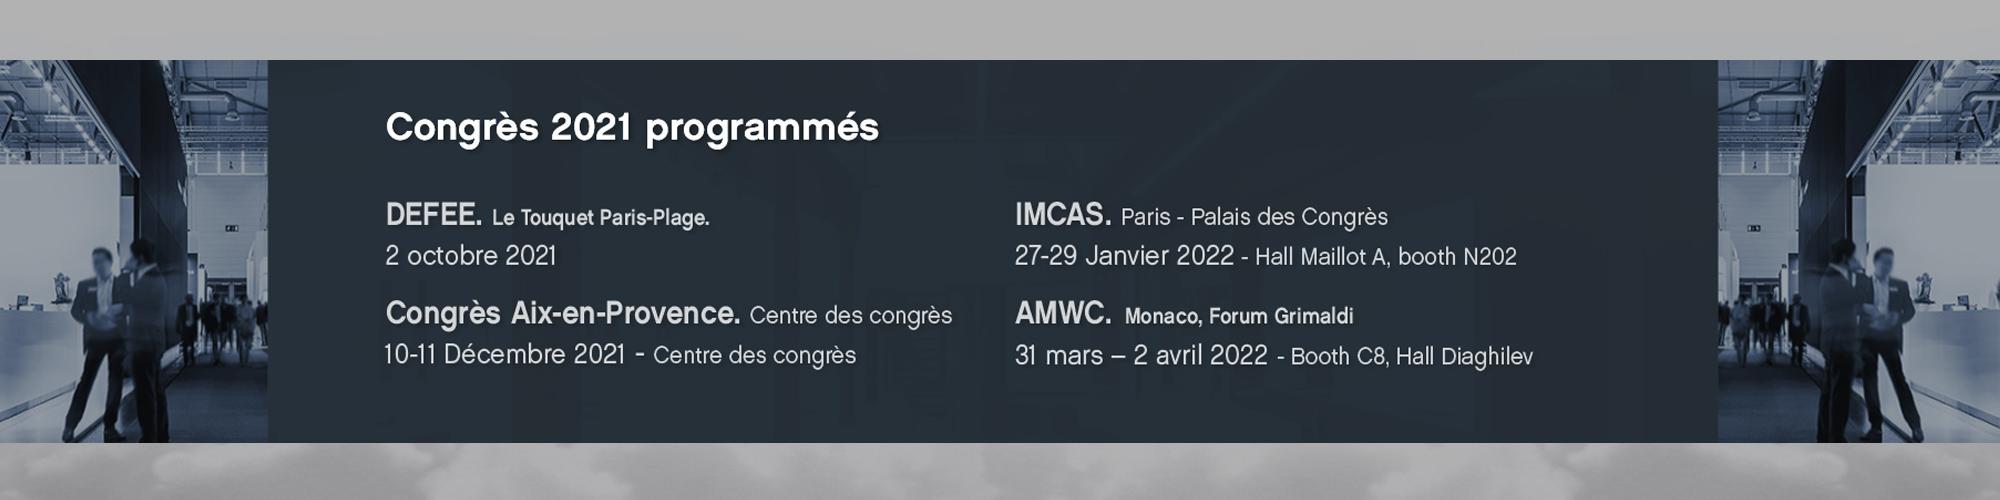 https://www.capactuel.com/storage/app/media/Accueil/banniere-congres2021.jpg